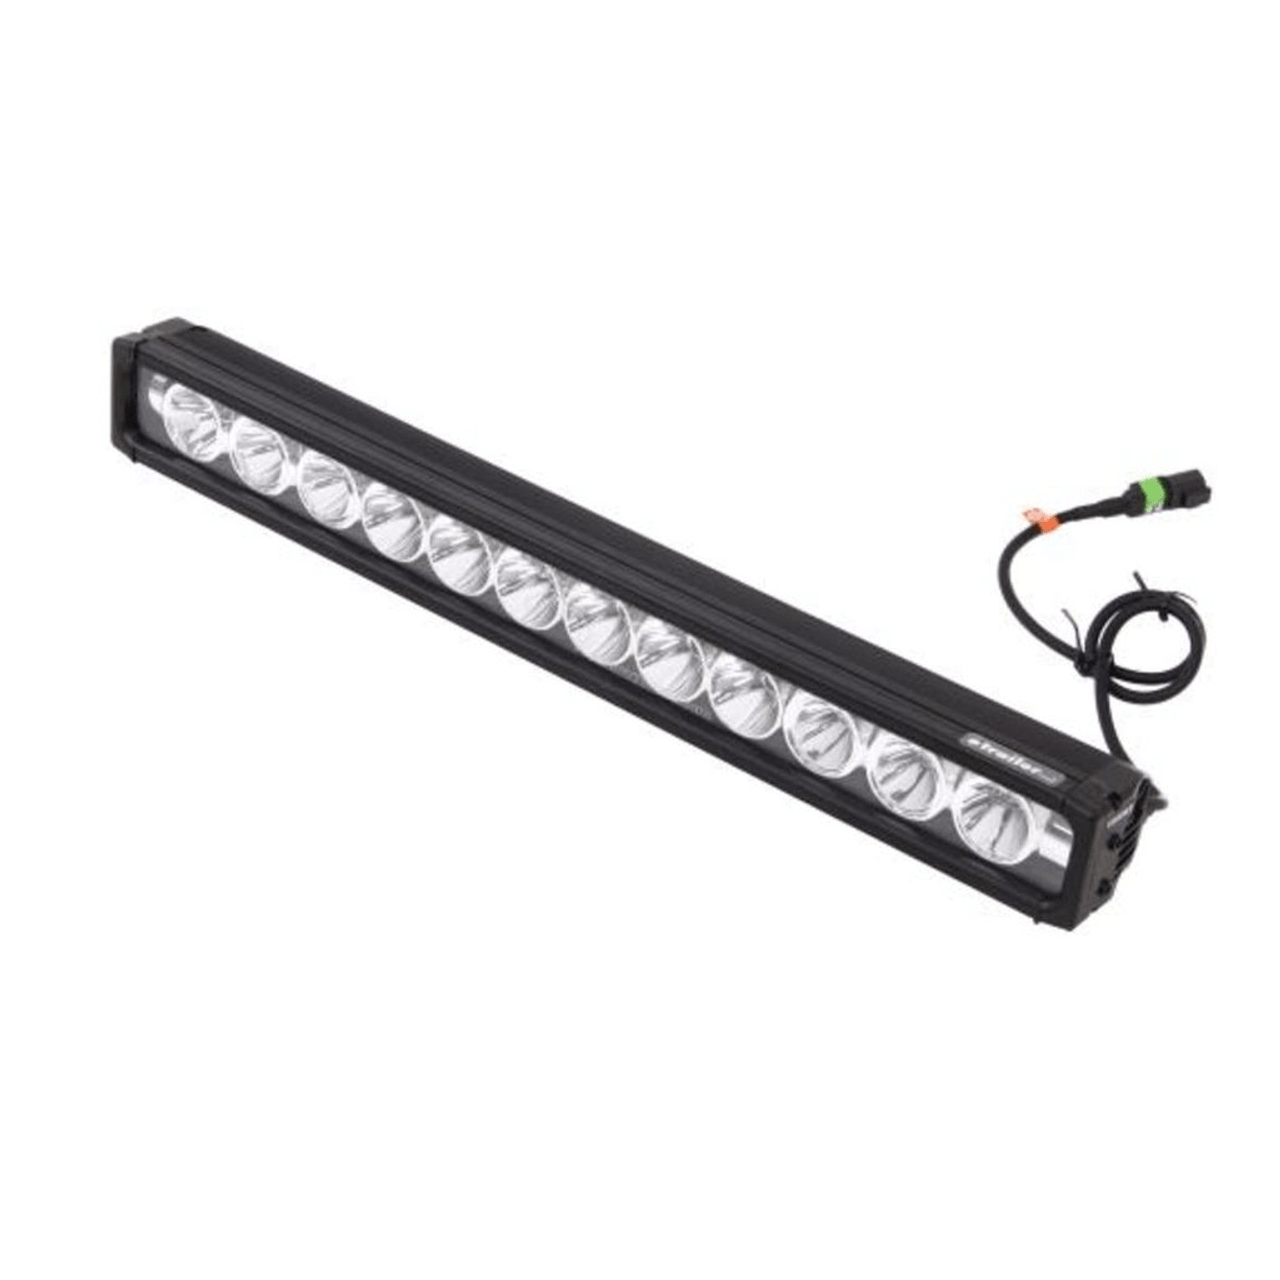 LED Light Bar by Vision X